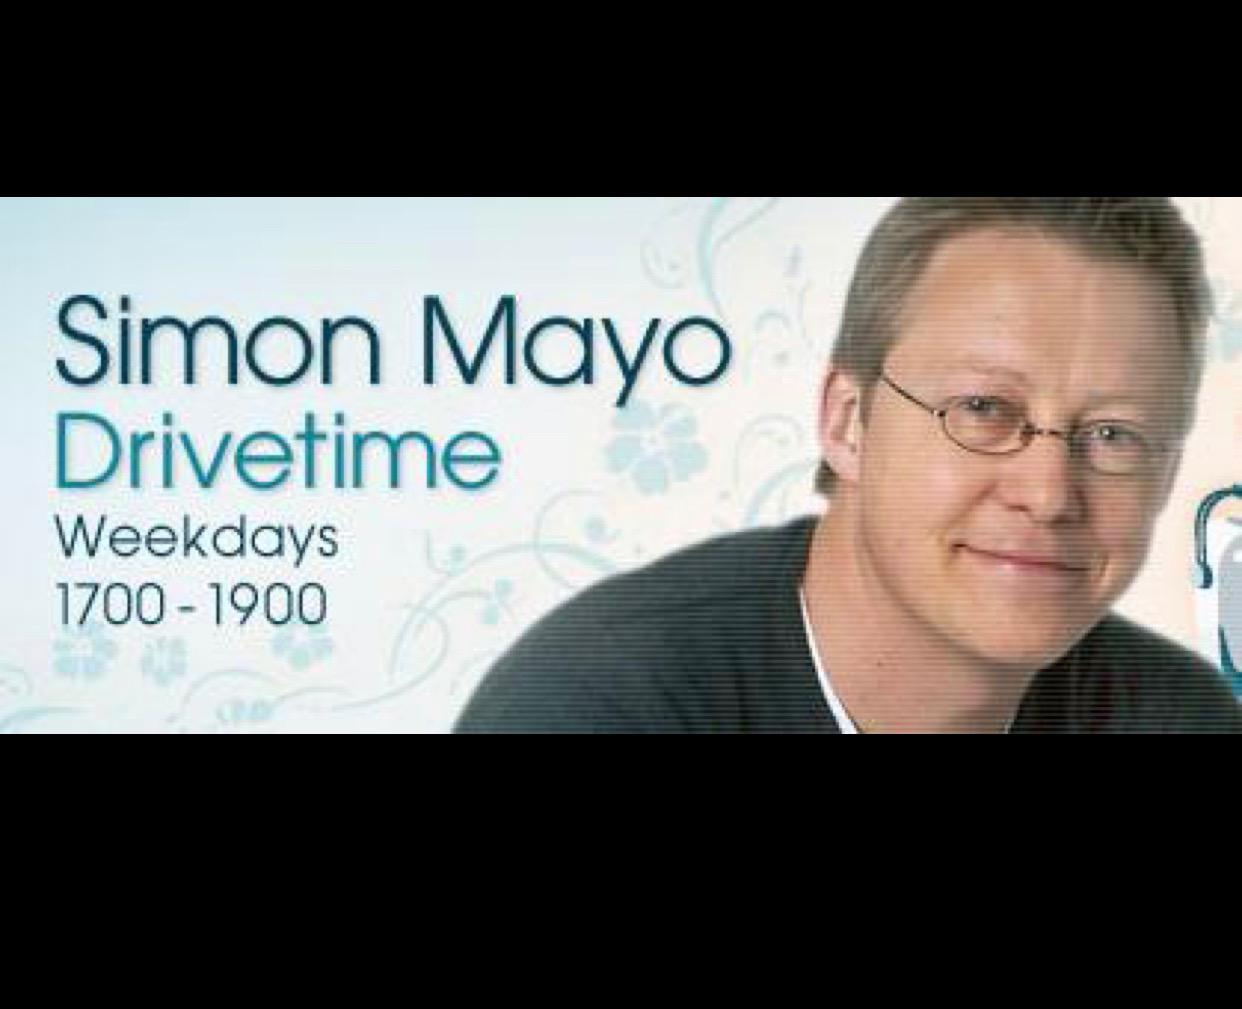 RADIO INTERVIEW, SIMON MAYO DRIVETIME, 2014